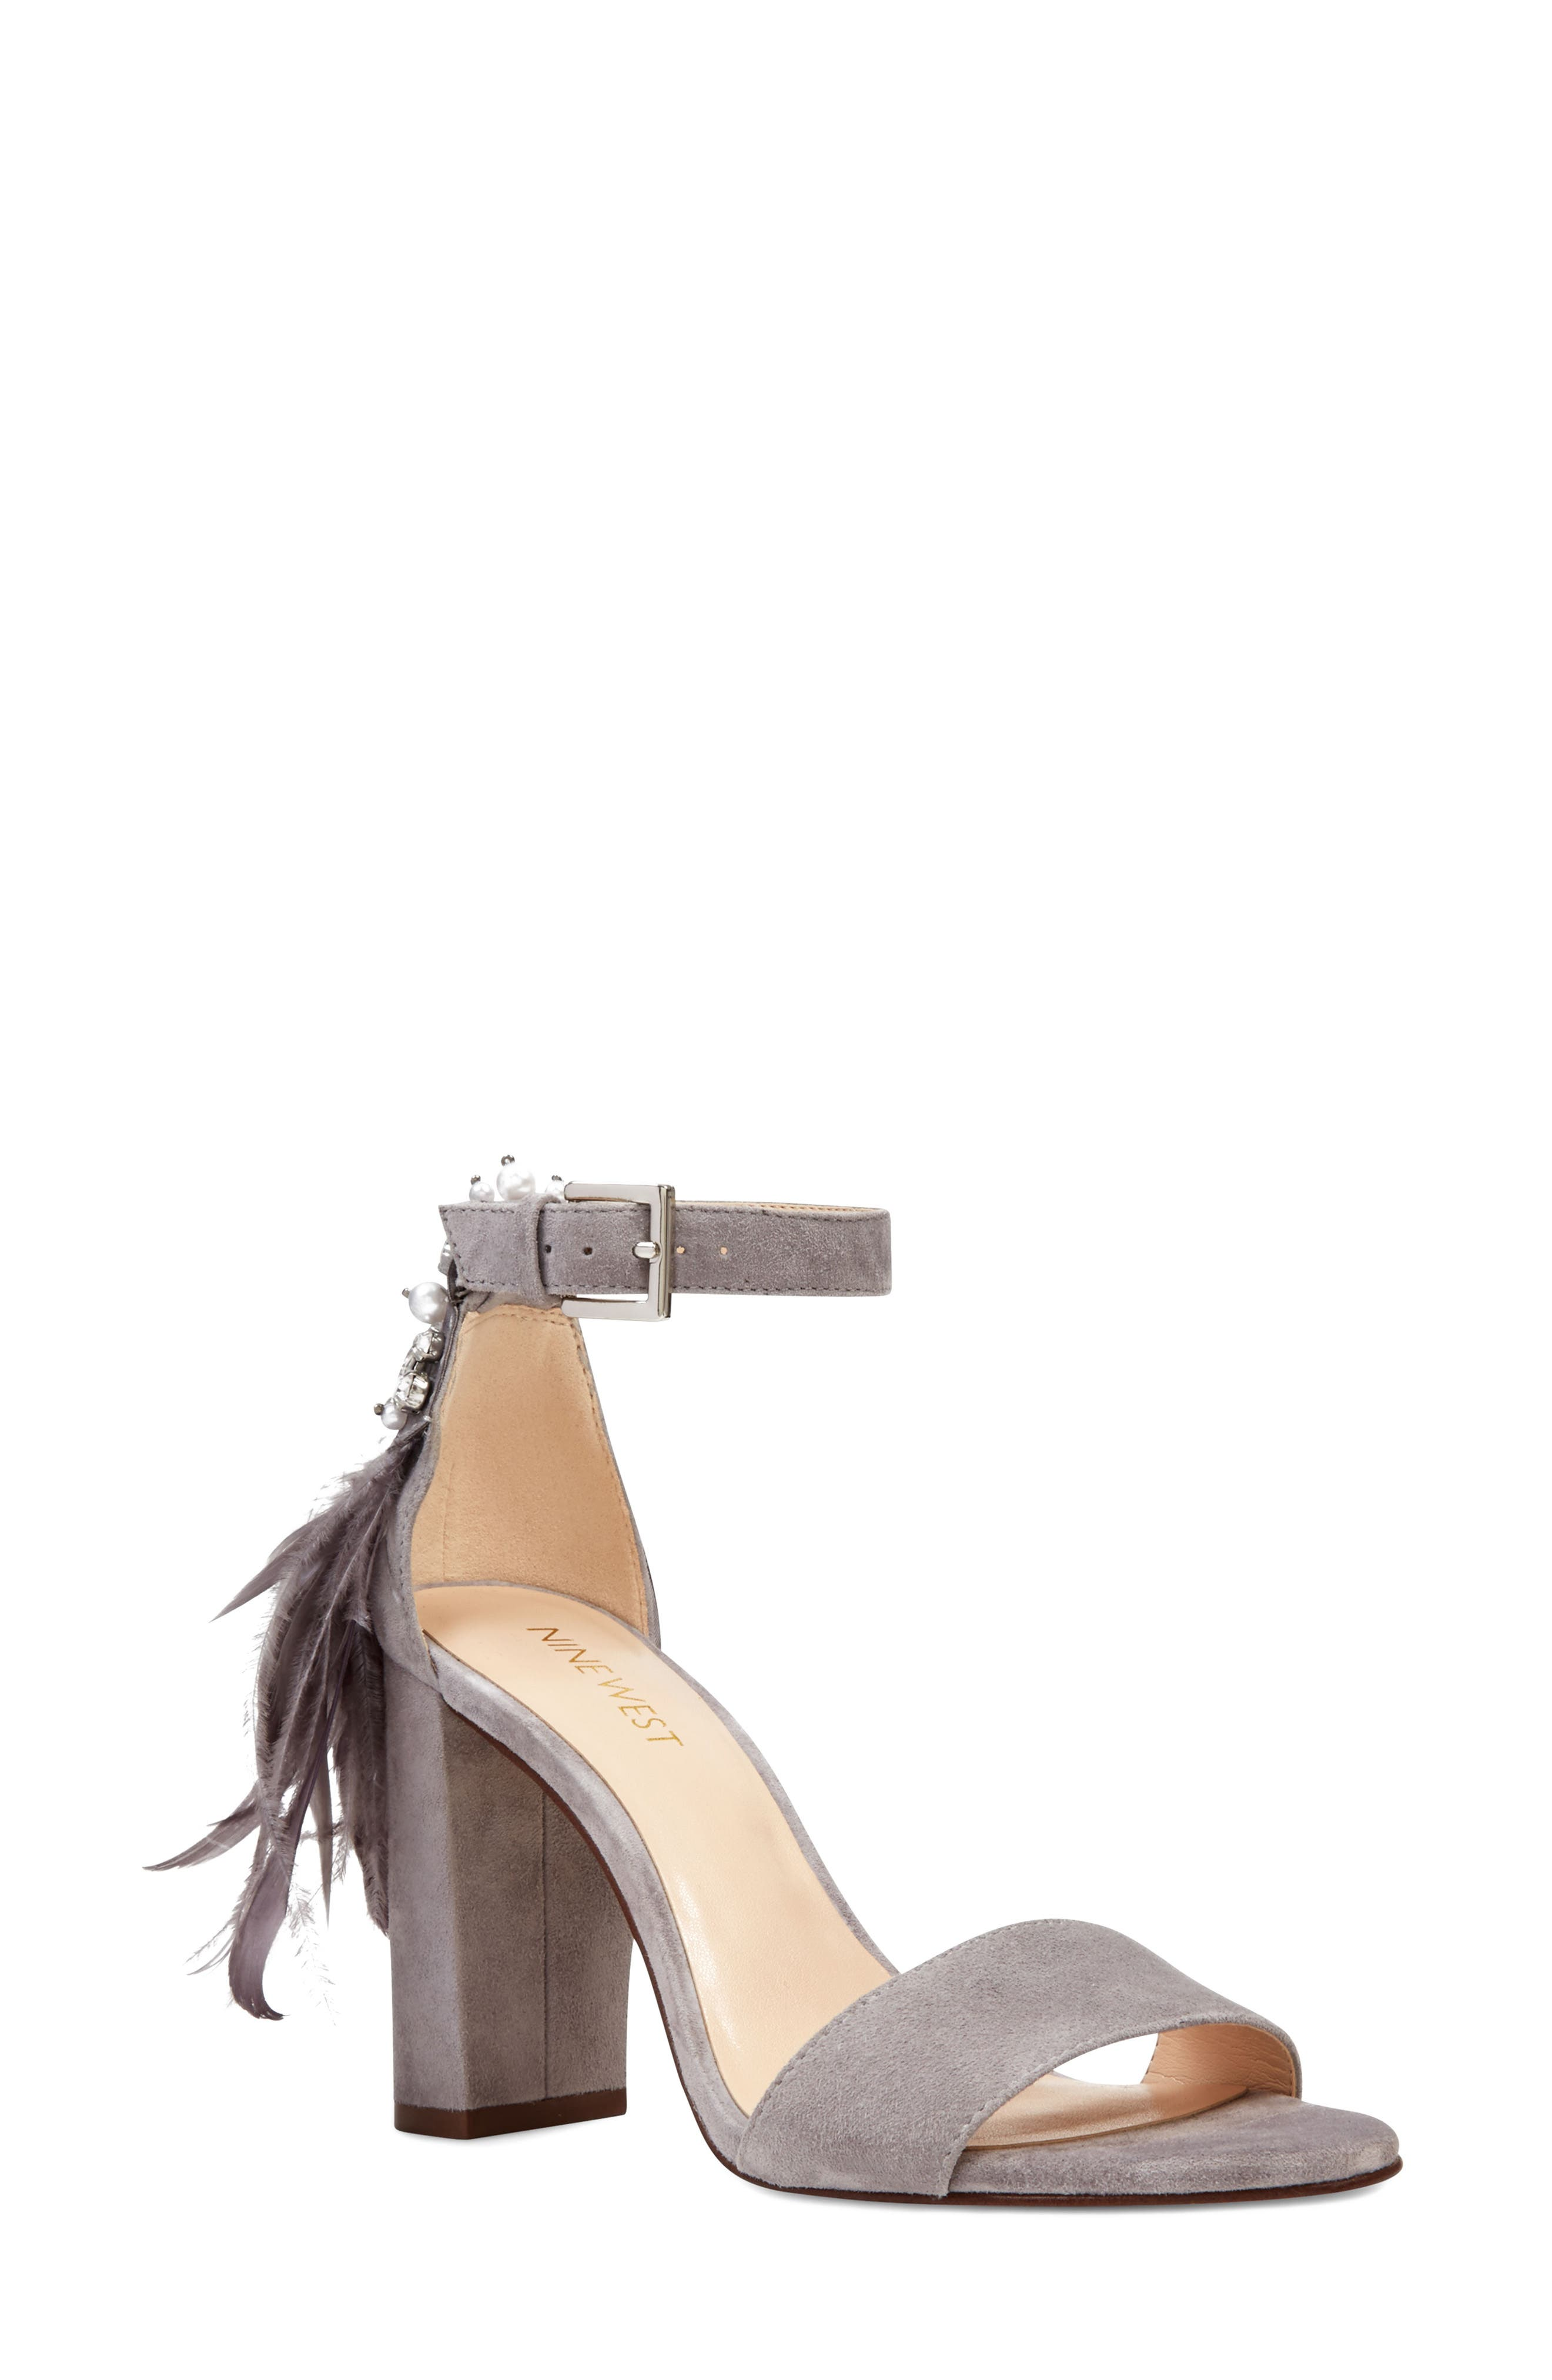 Main Image - Nine West Aaronita Feather Block Heel Sandal (Women)